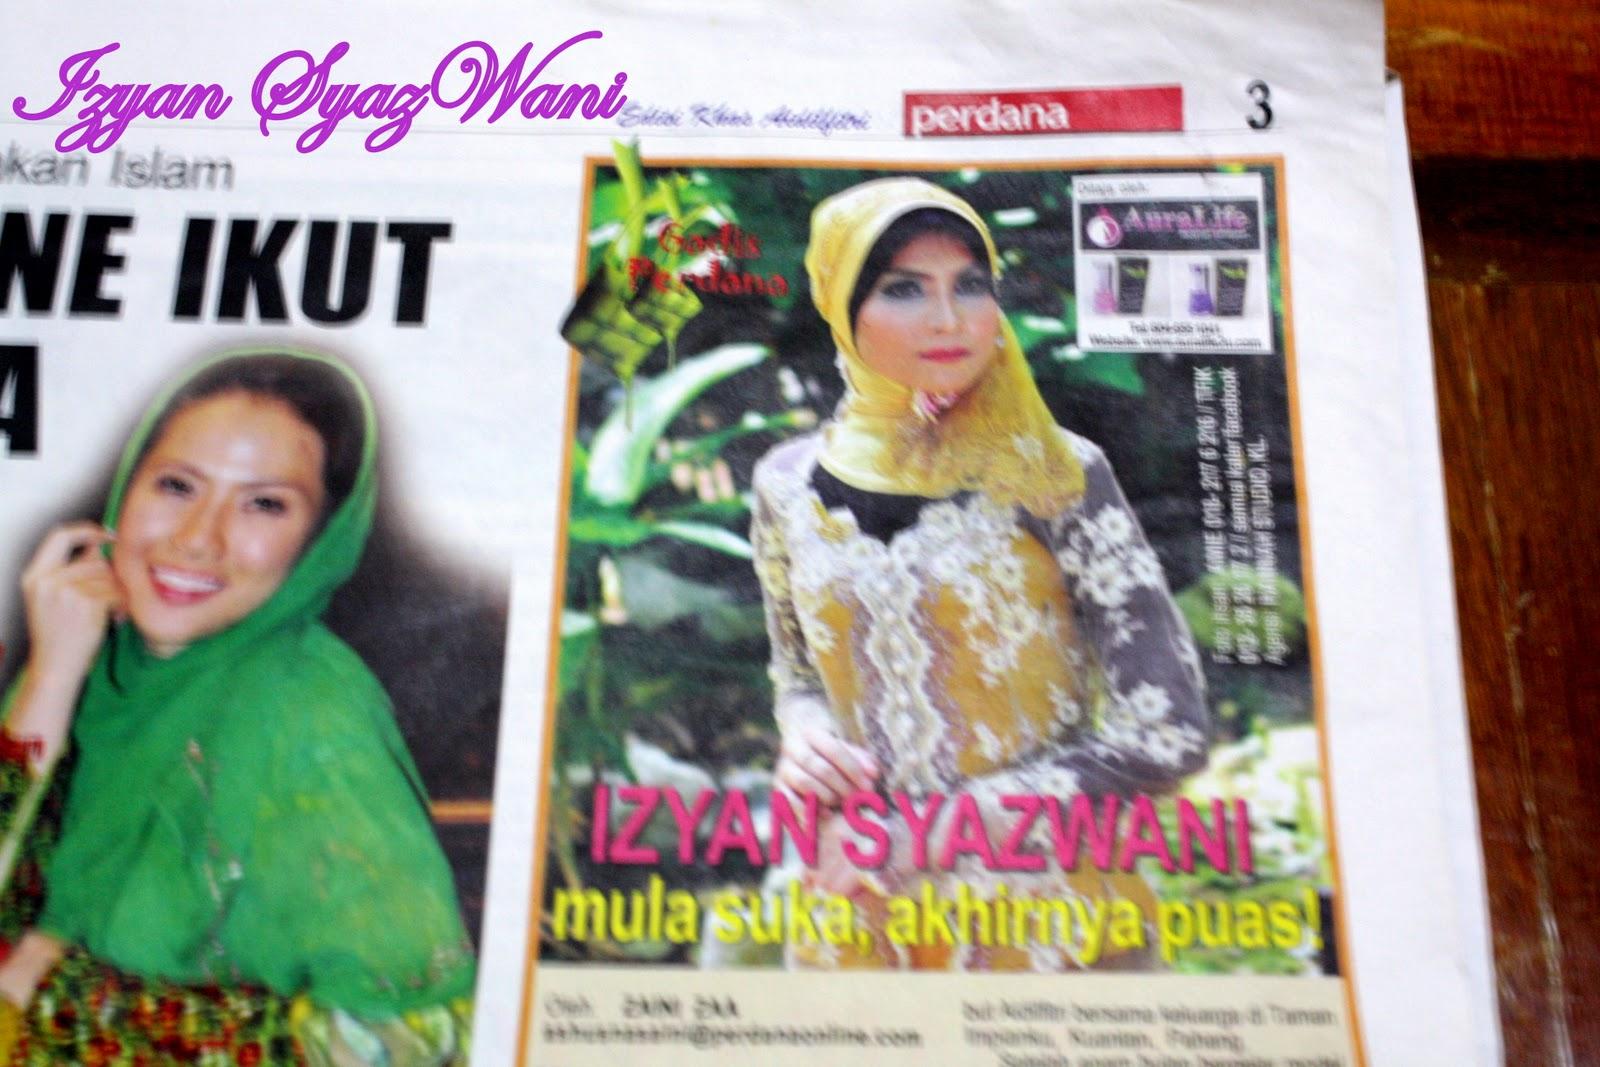 http://2.bp.blogspot.com/_lKISdXg5Alc/TQNGU1rE2qI/AAAAAAAAAsE/nnpRrU_aUYI/s1600/IMG_0044paper.jpg